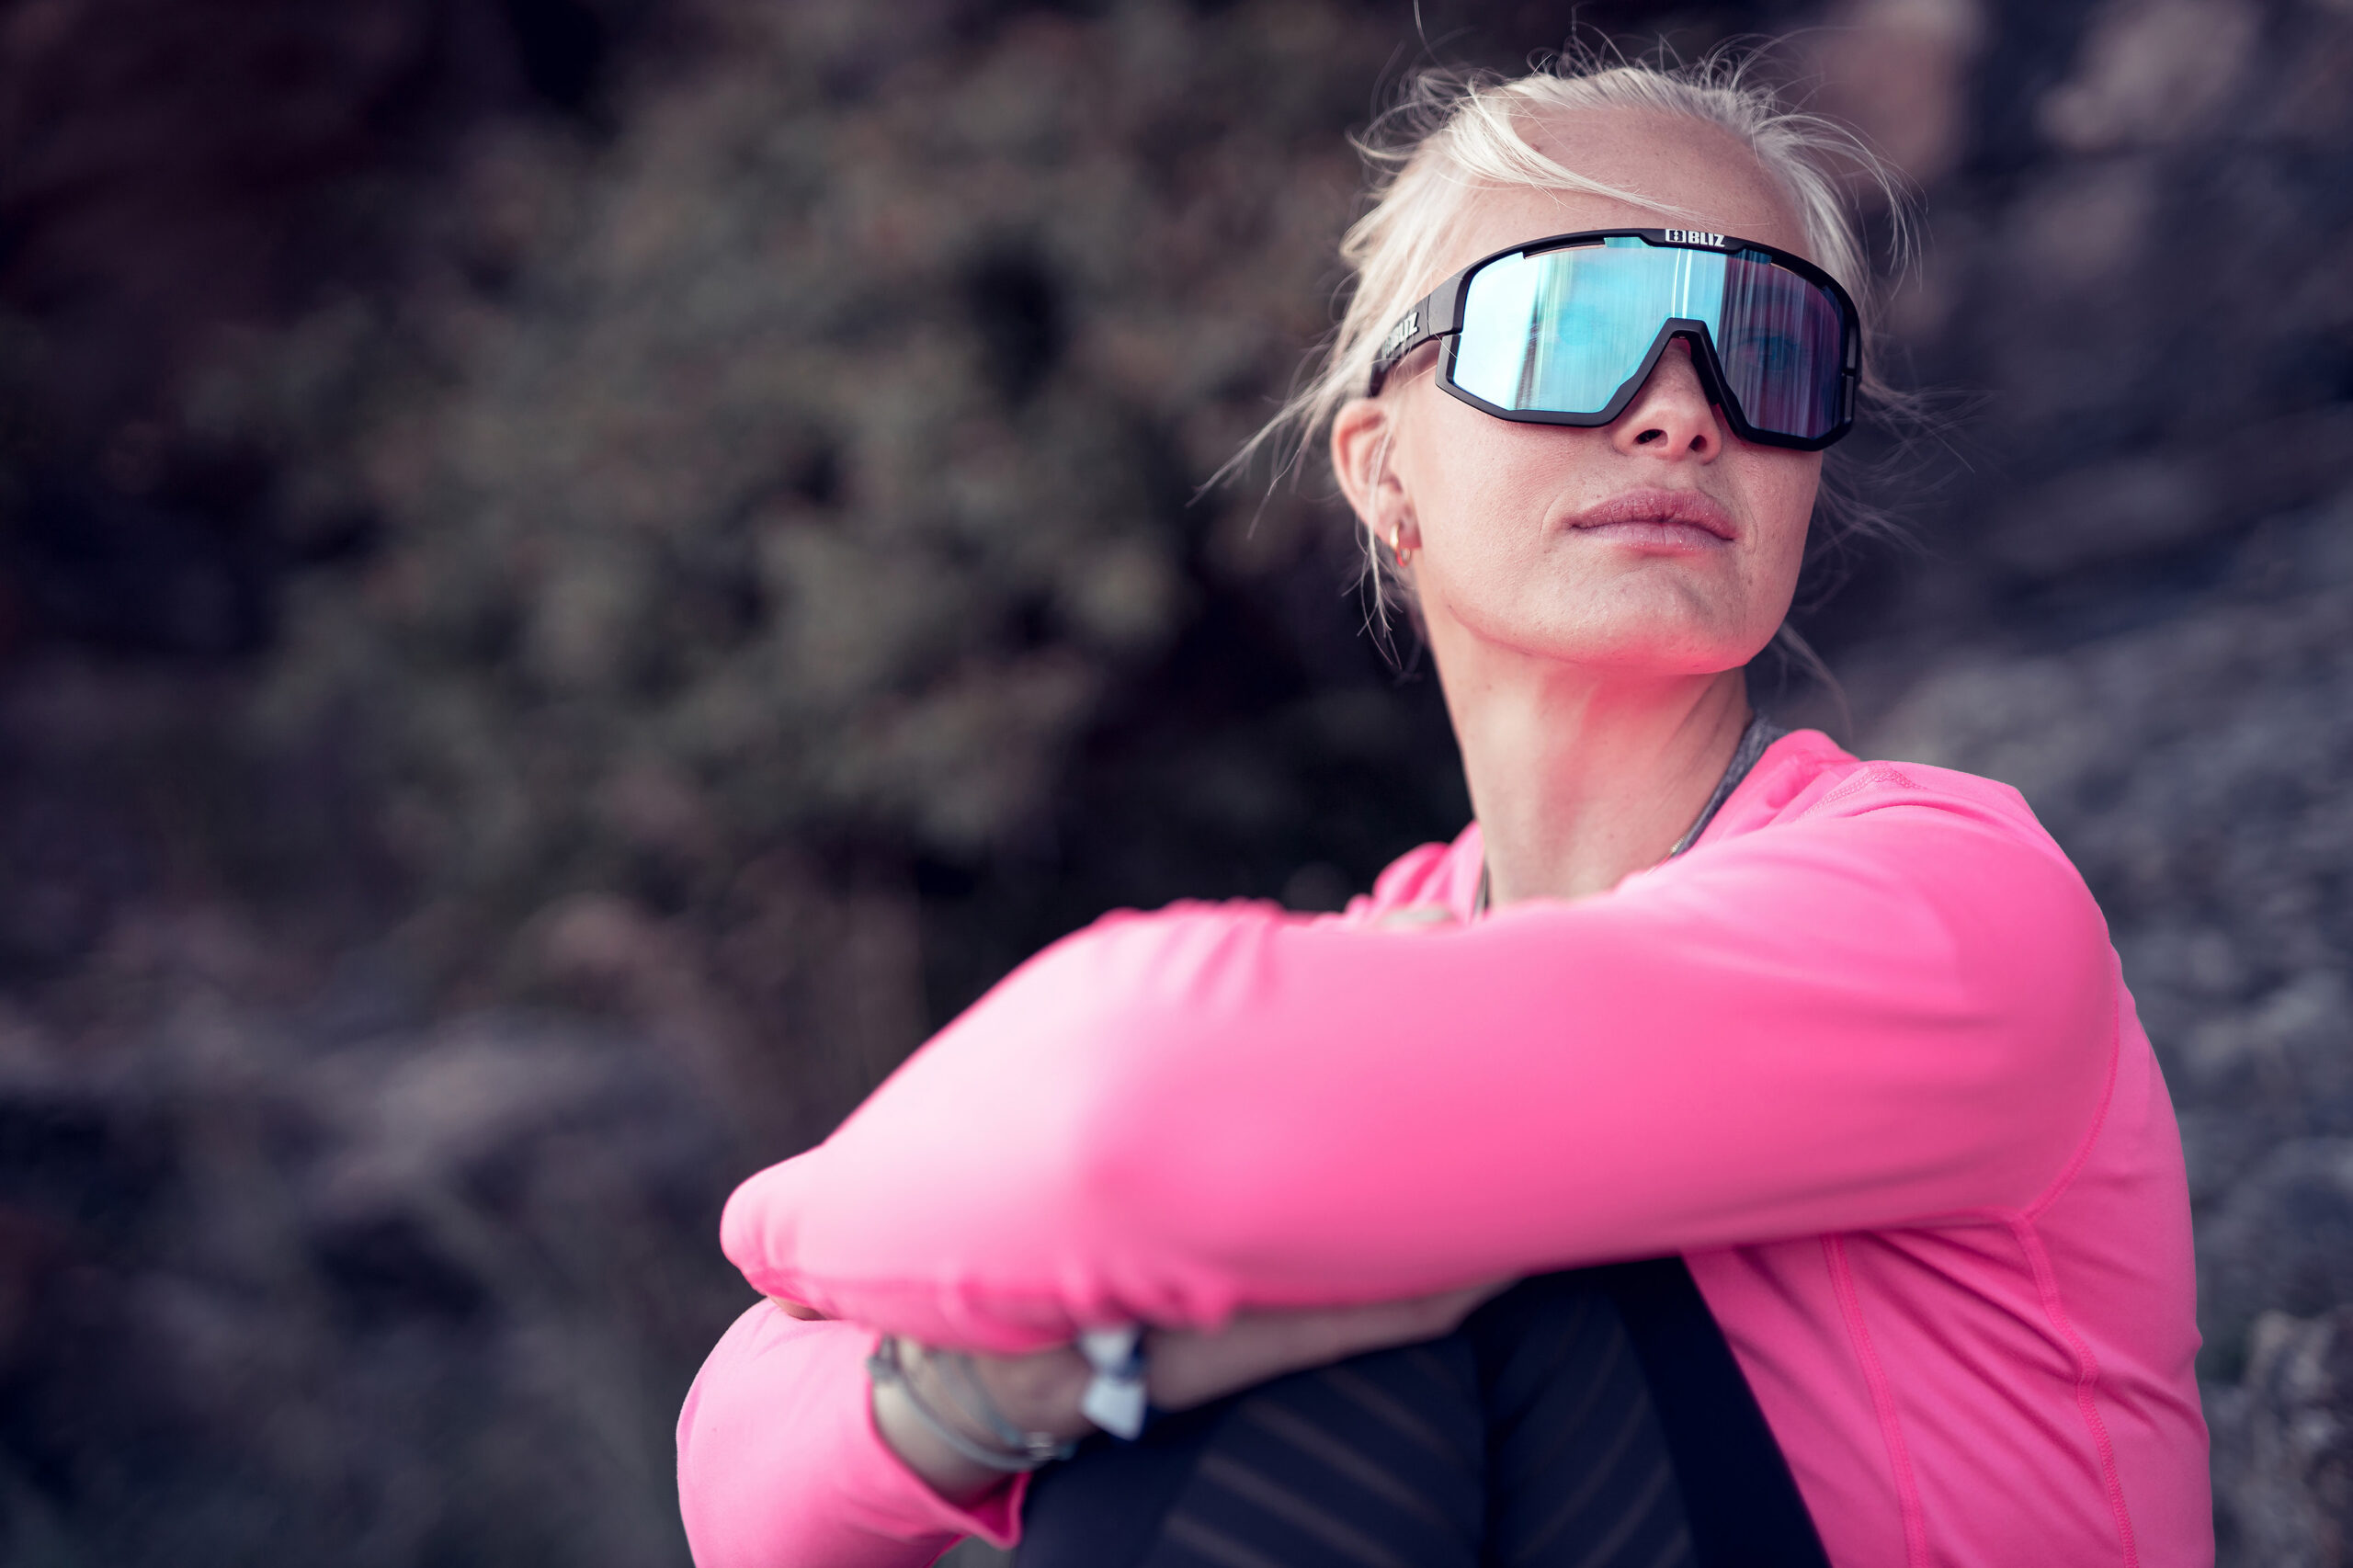 52005-14n_fusion NL-bliz sunglasses_lifestyle_matt black_sportsglasses_lovisa karlsson_lifestyle2